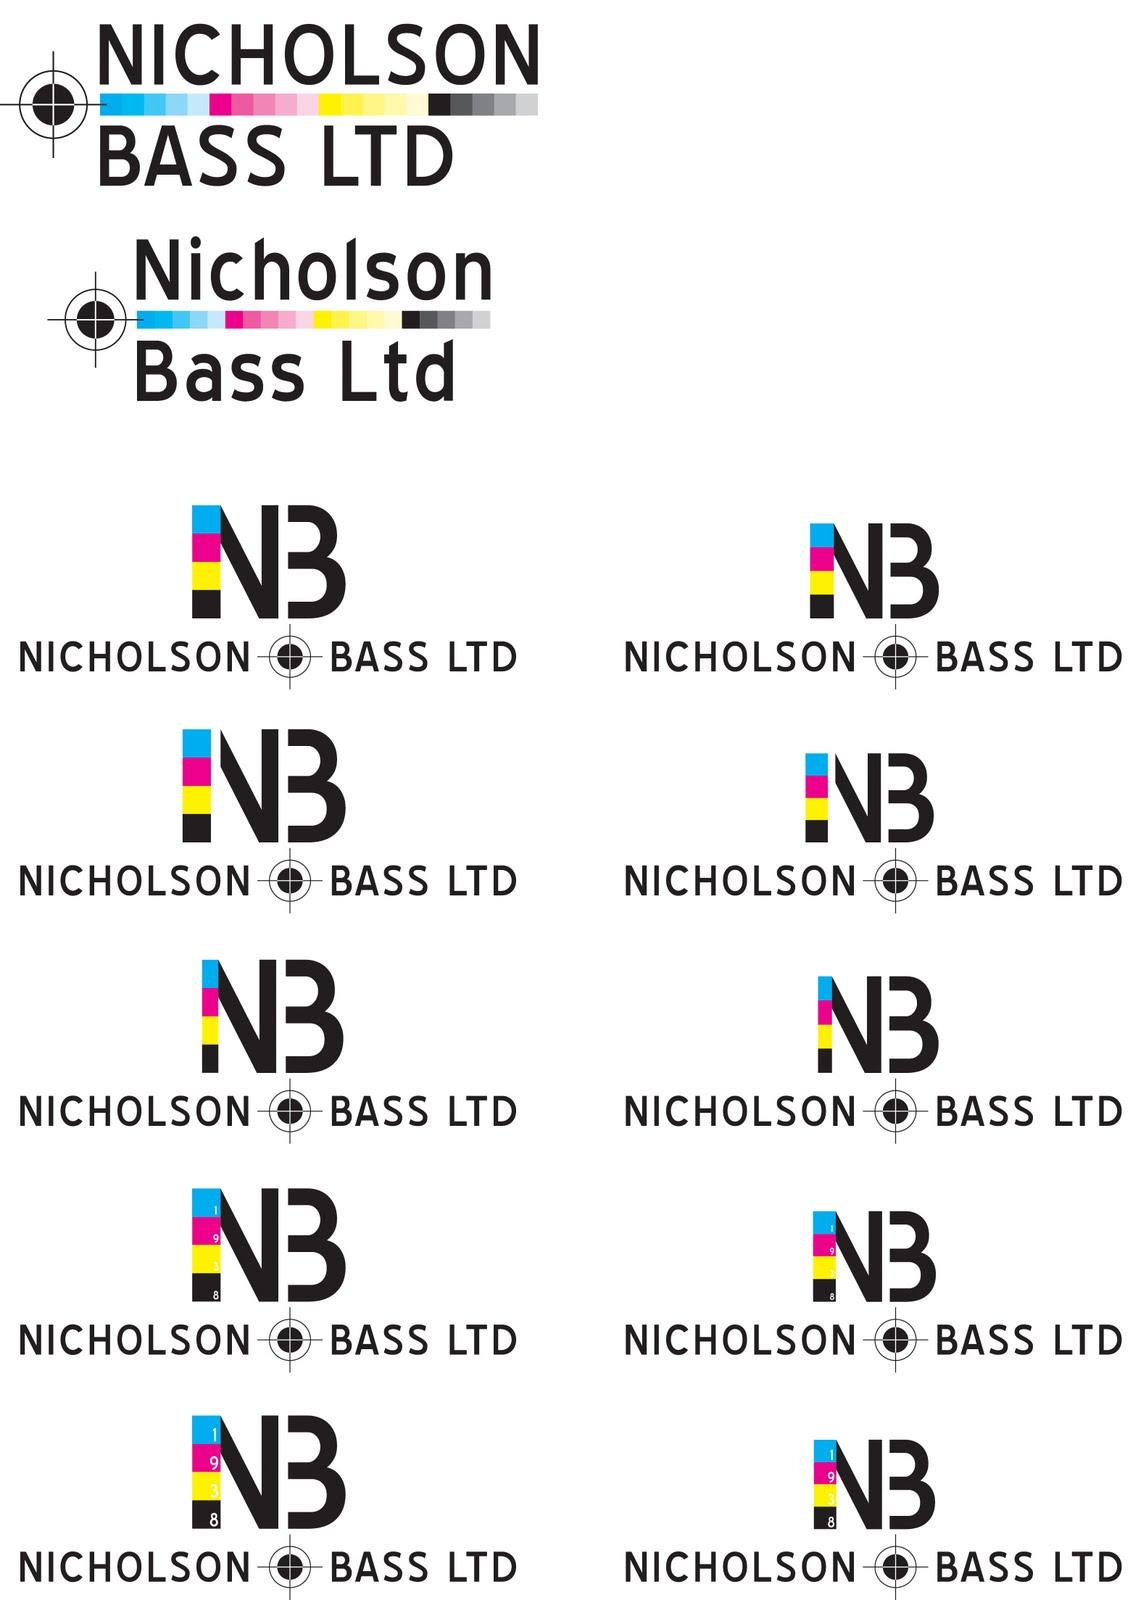 my design journal nicholson and bass ltd new brand image